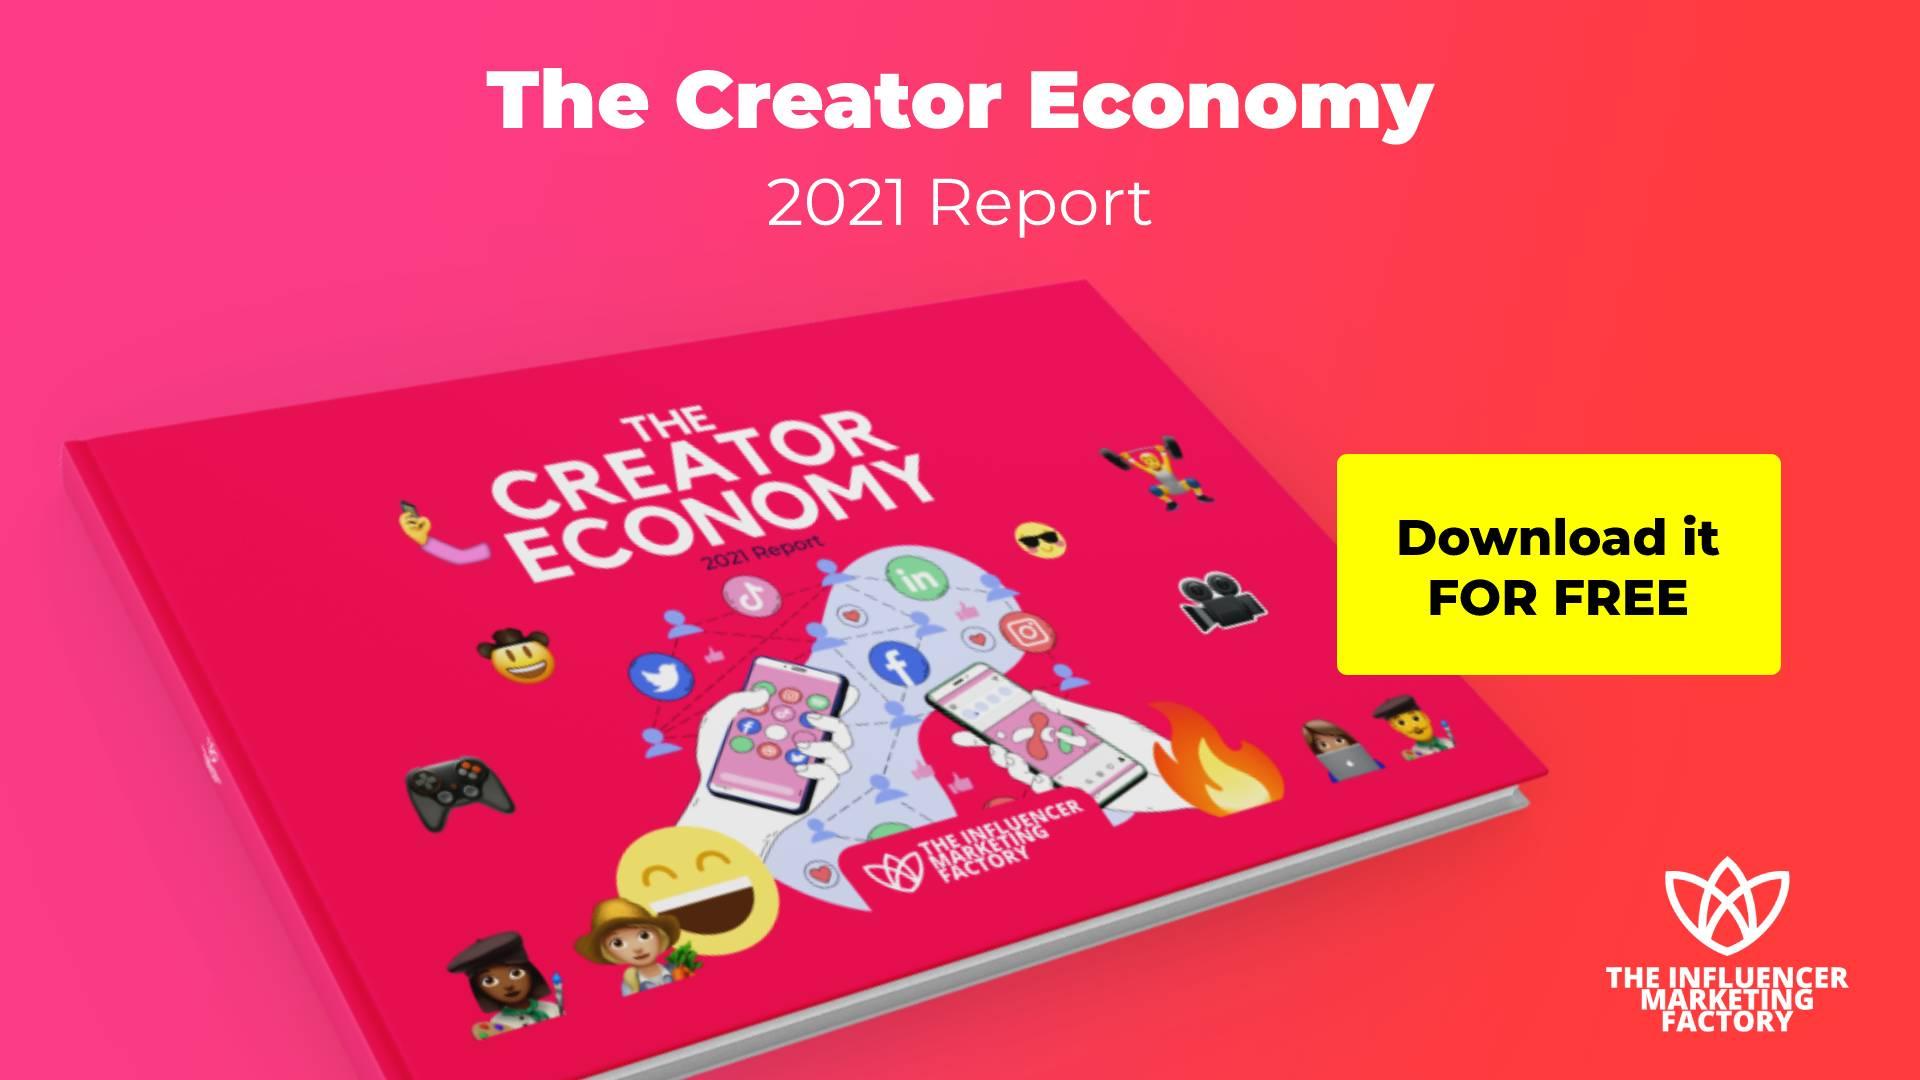 The Influencer Marketing Factory header image